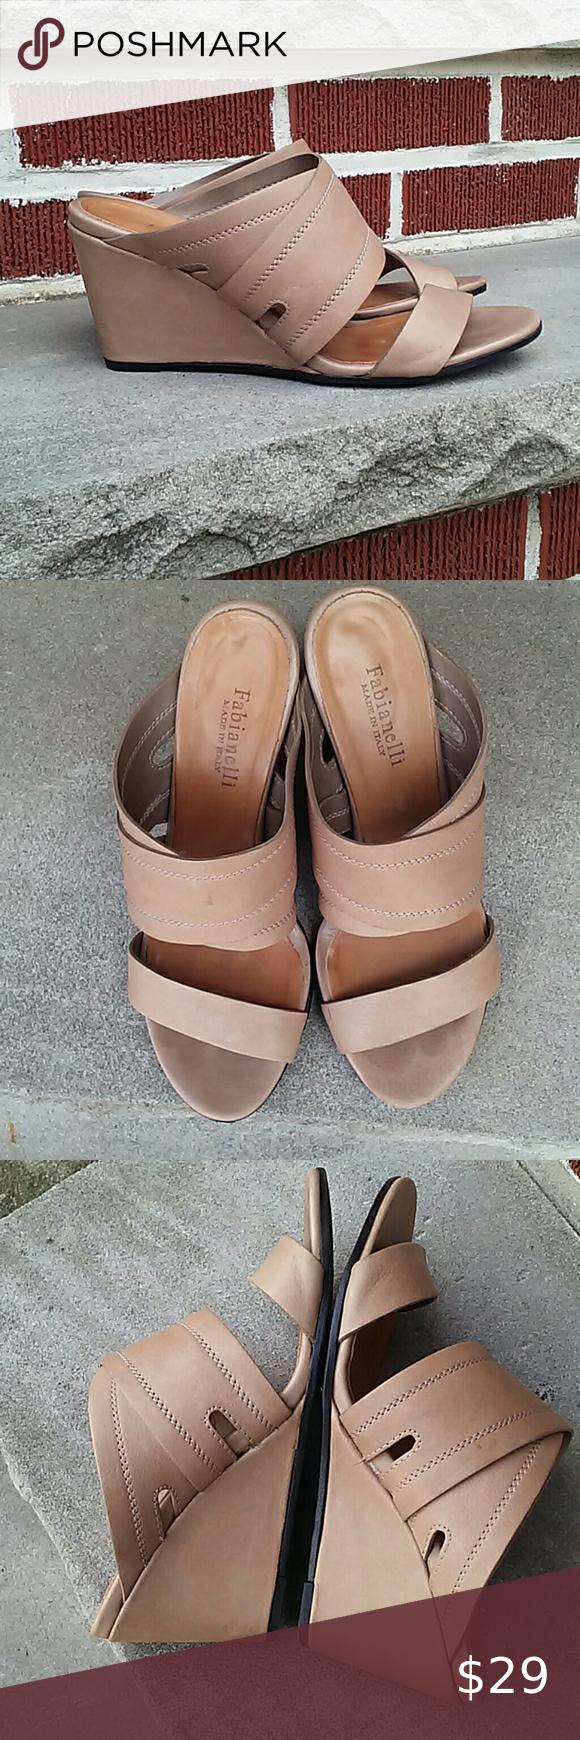 Sandale KAZAR - Heather 37474-01-B2 Beige | Sandals heels